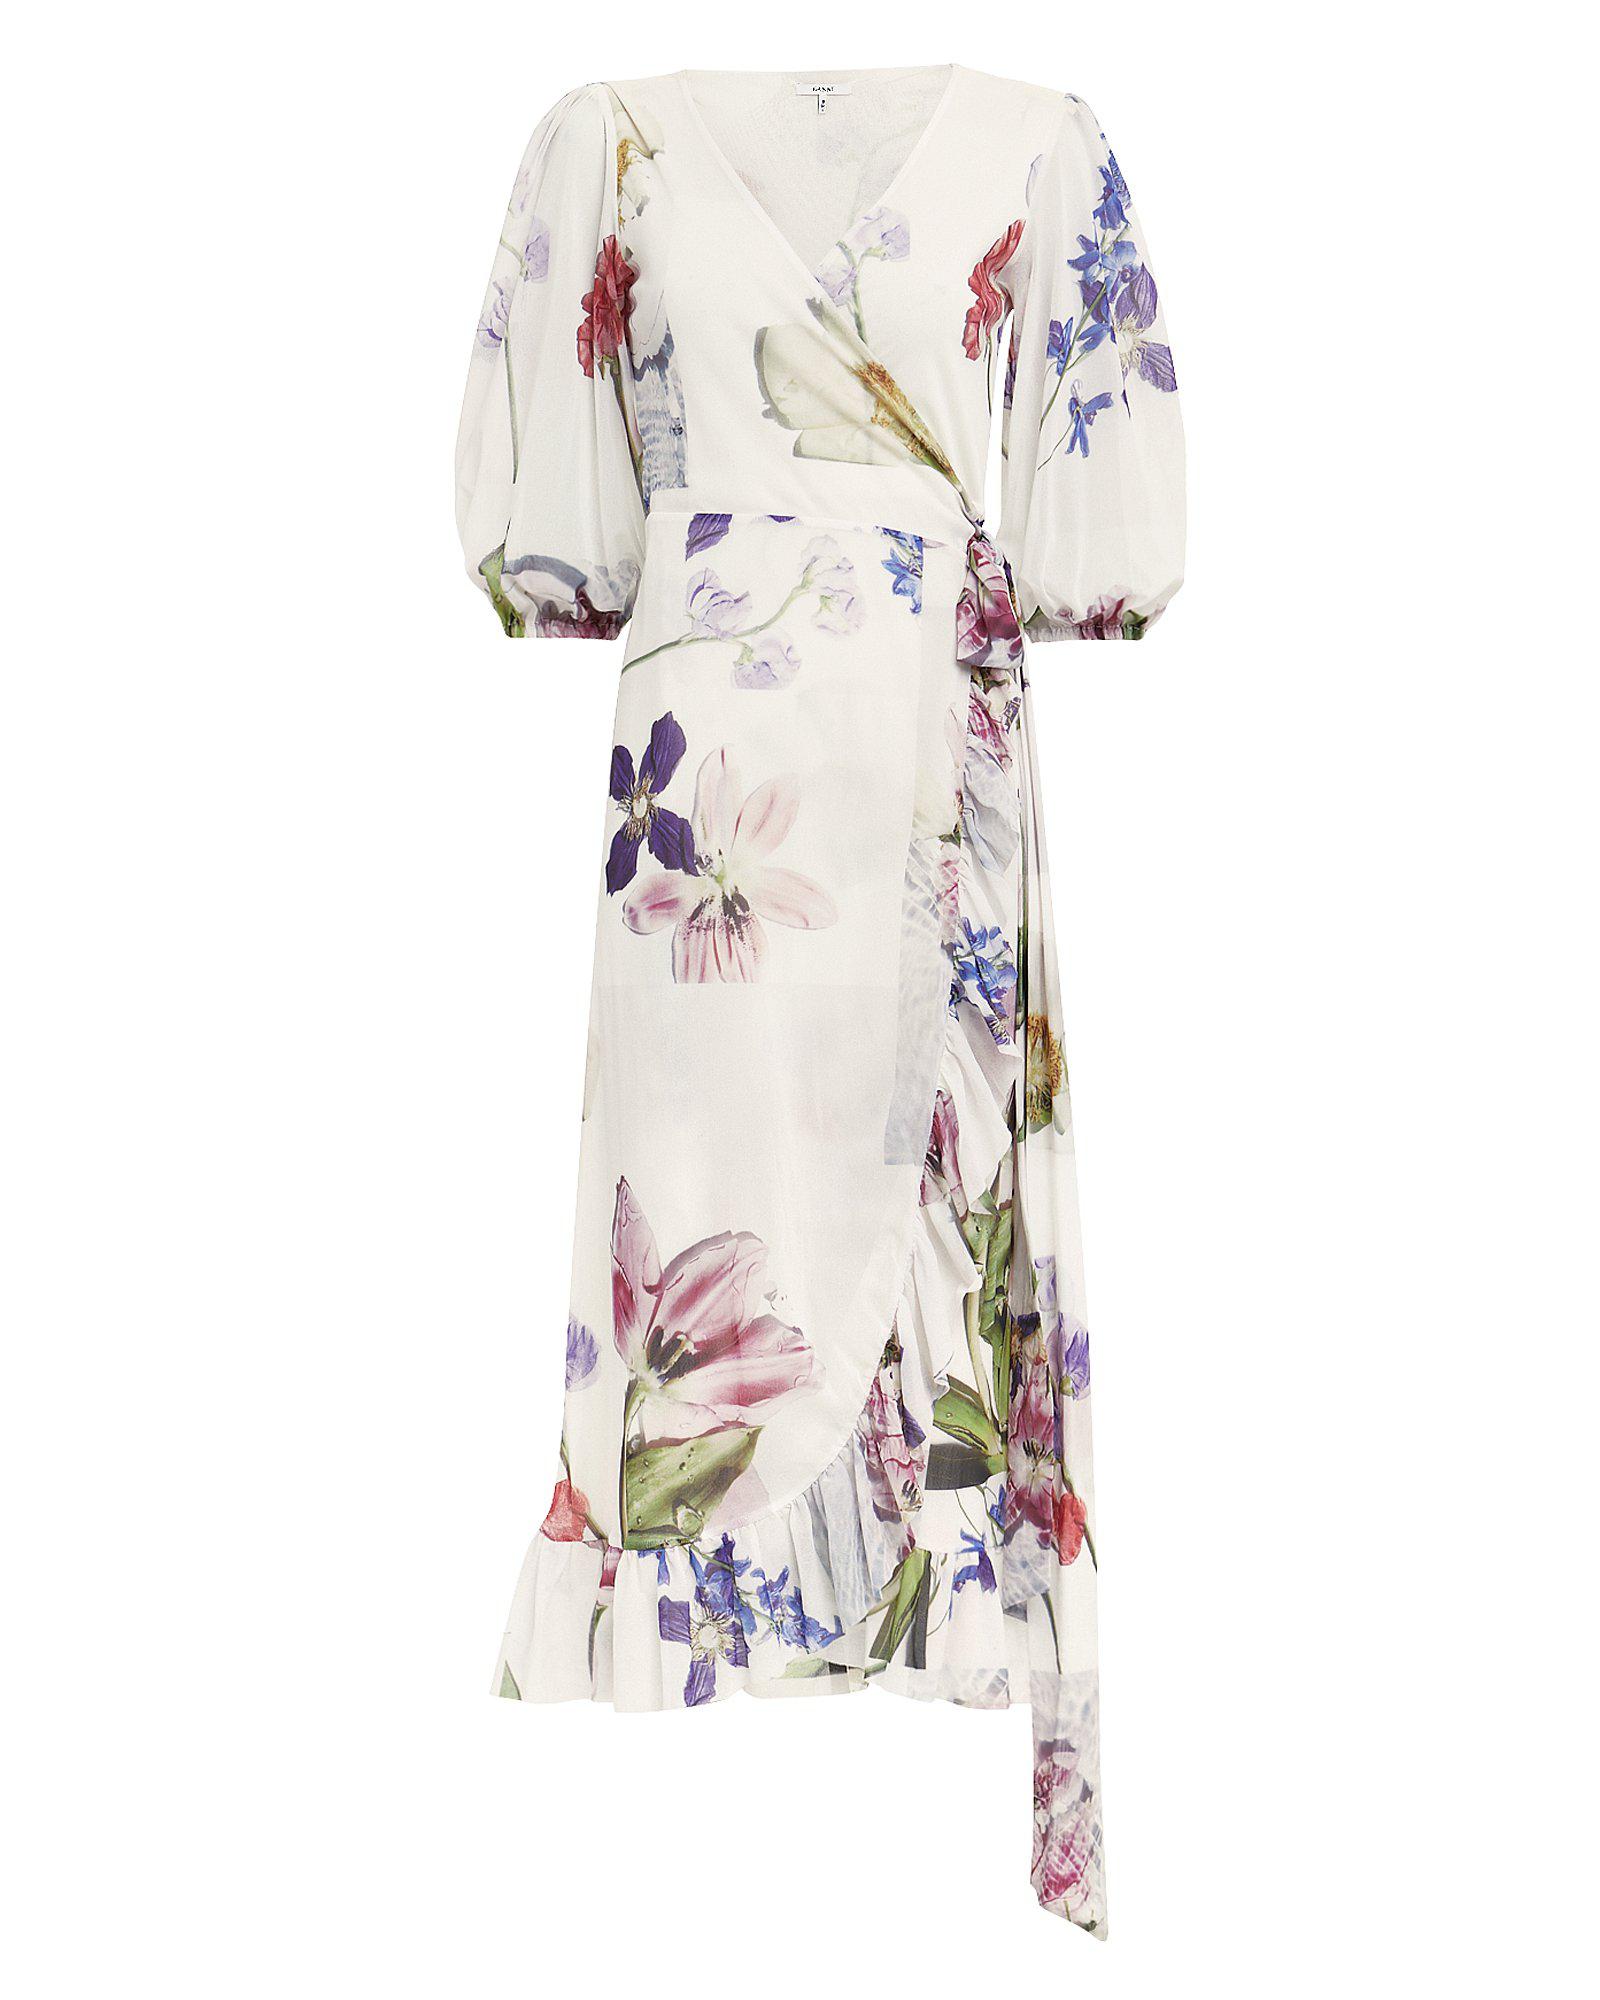 ae24296c39 Ganni Floral-Print Ruffle Half-Sleeve Wrap Dress